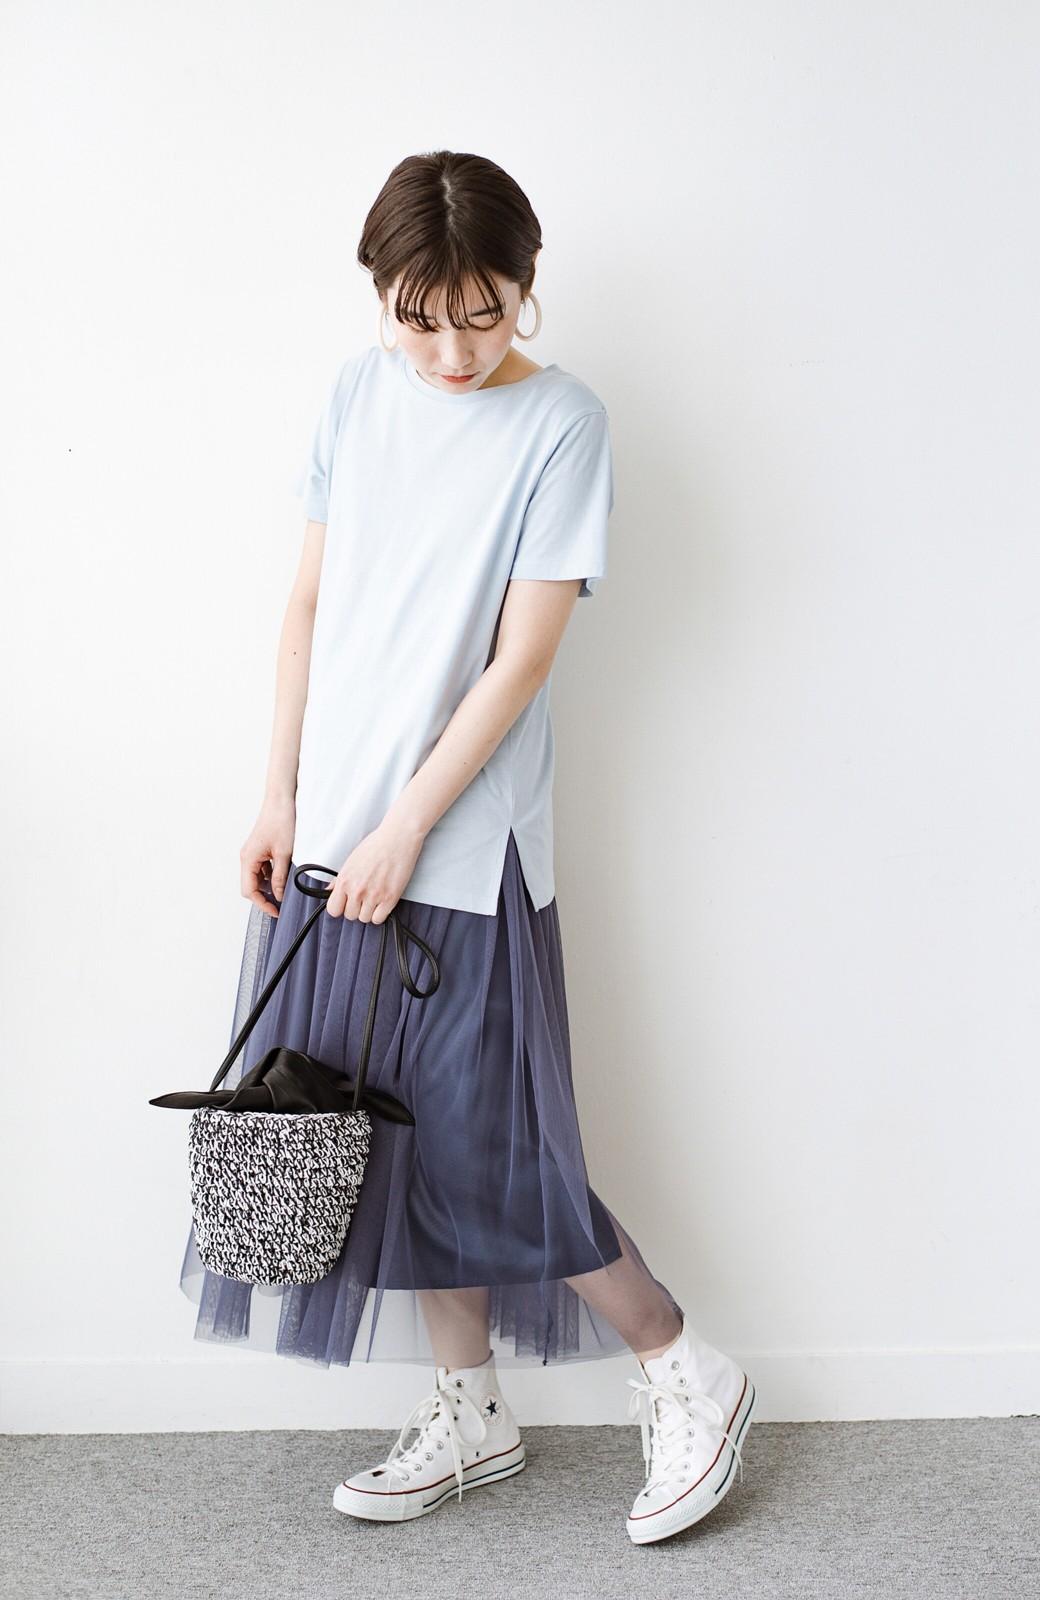 haco! 汗染み軽減加工で安心!1枚でも重ね着にも便利なシンプルTシャツ by ZAMPA <サックスブルー>の商品写真5